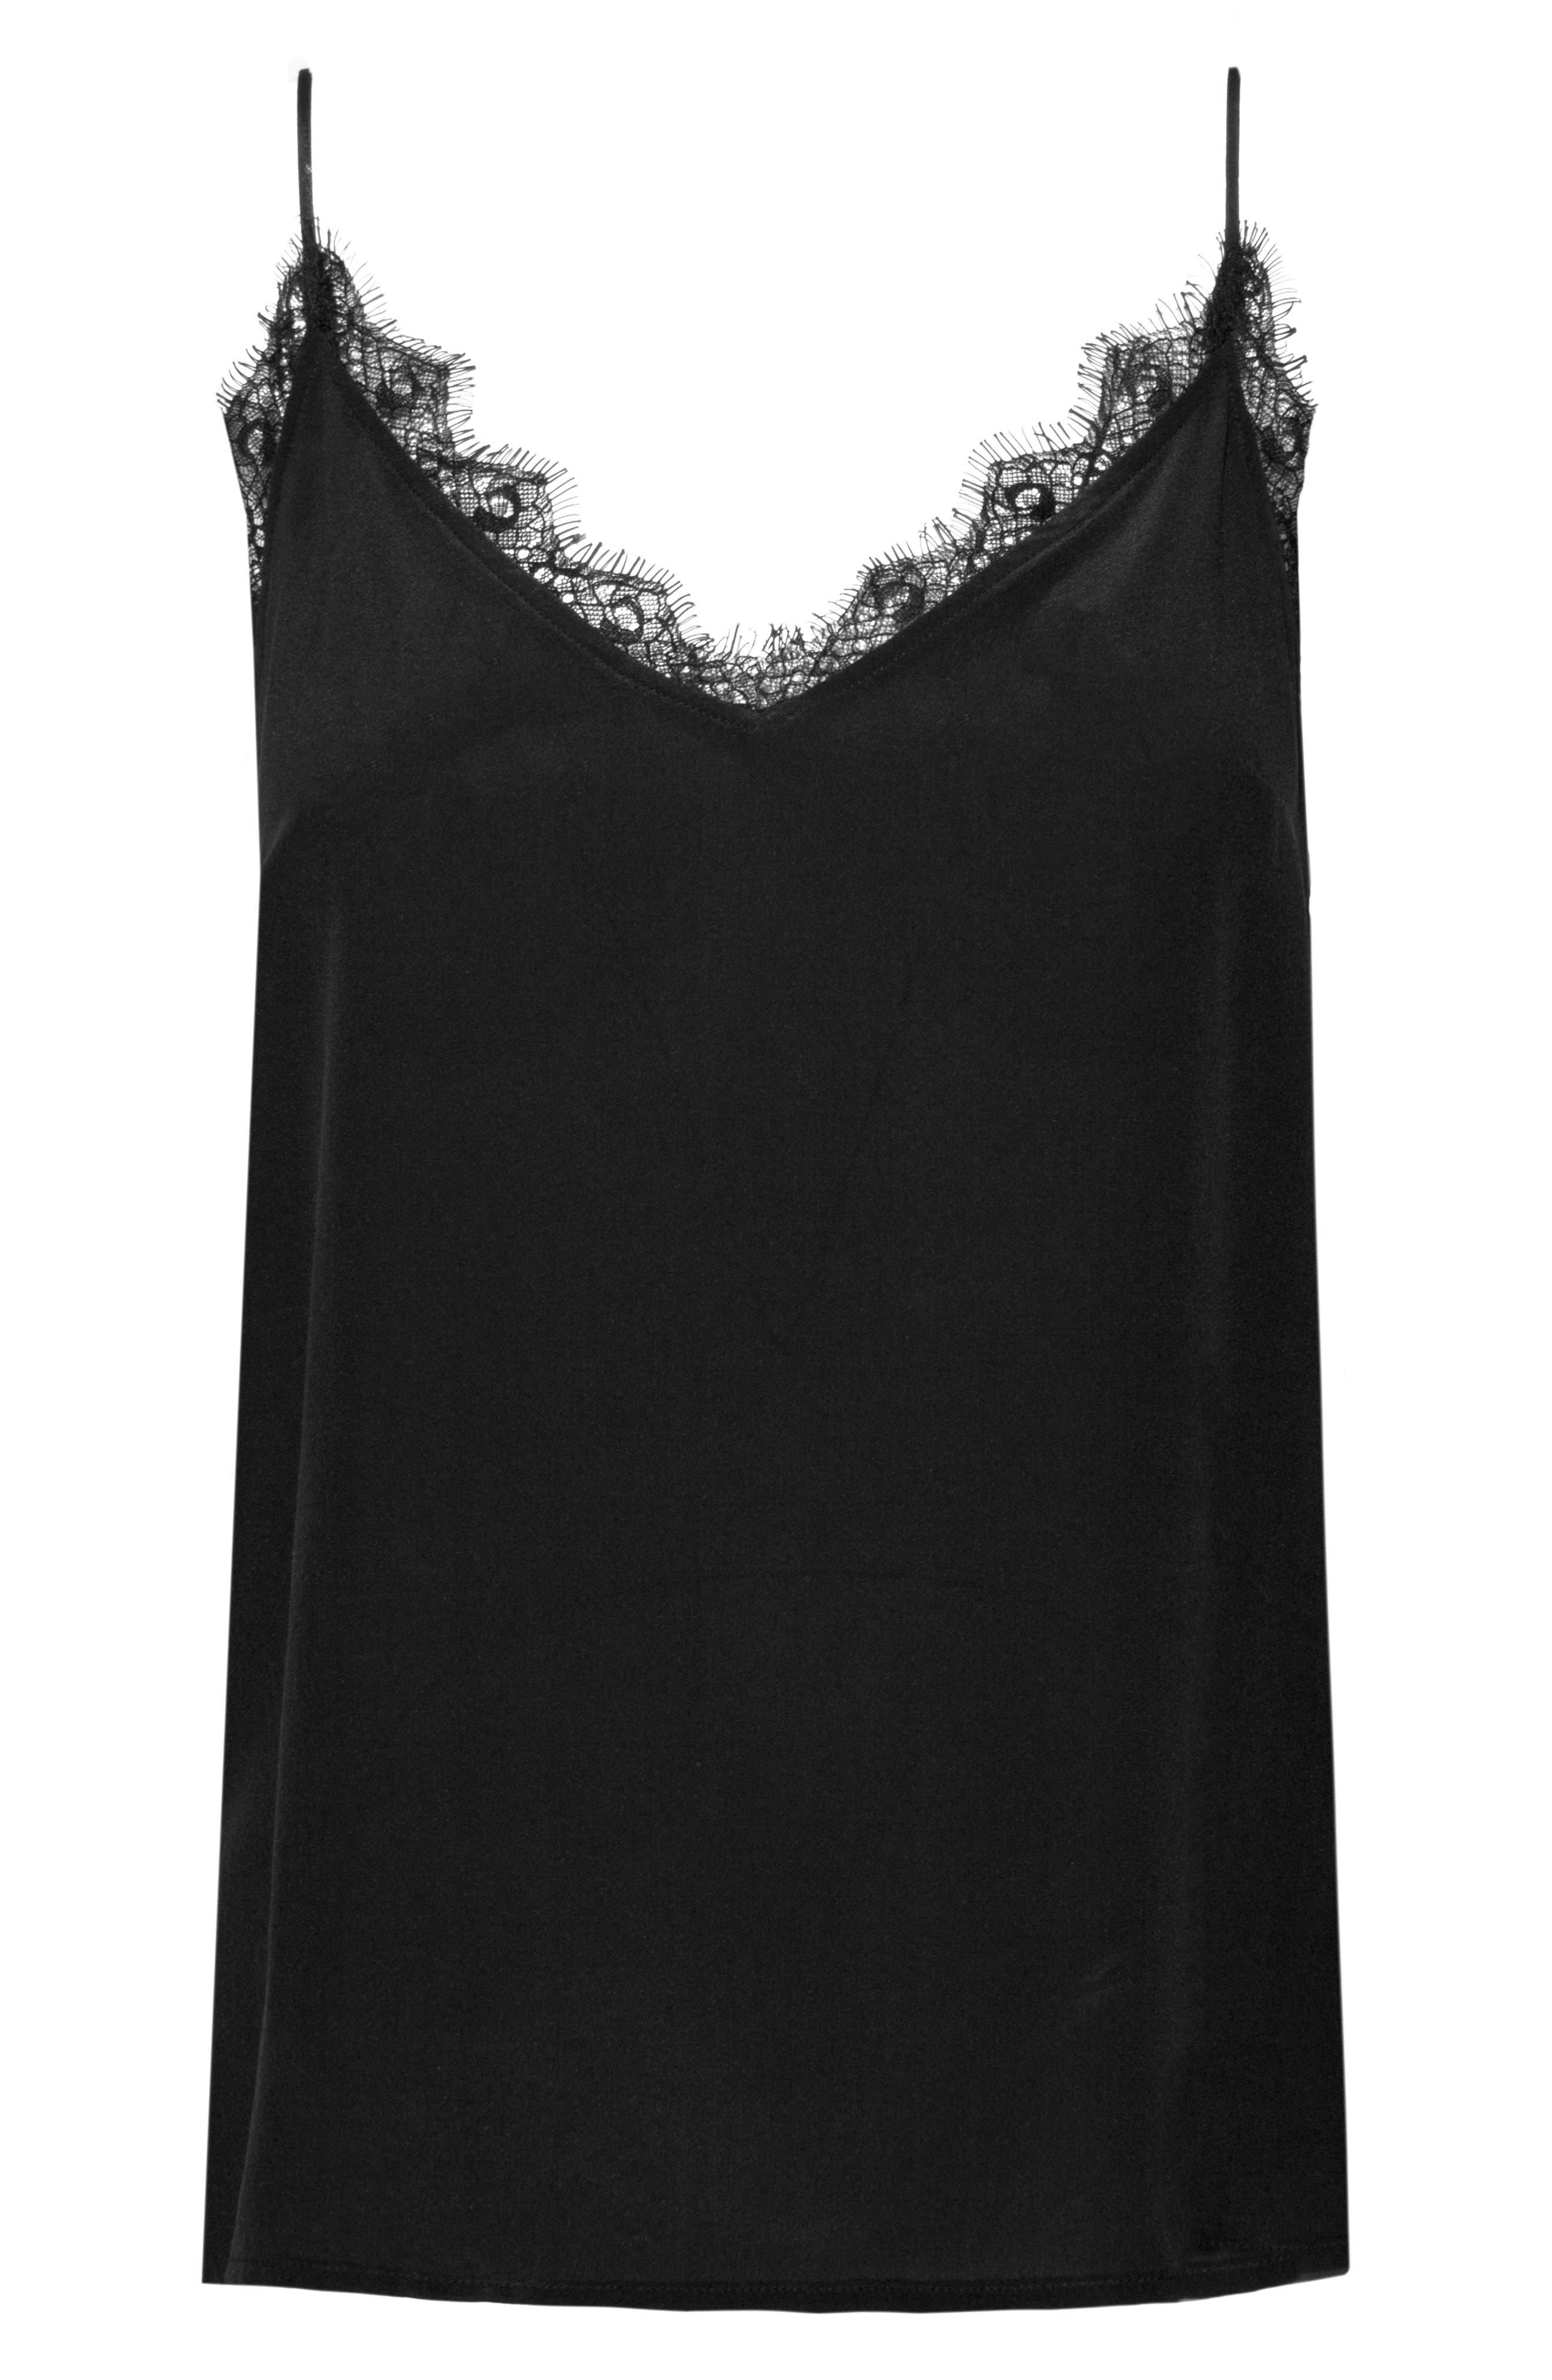 ANINE BING,                             Lace Trim Silk Camisole,                             Alternate thumbnail 4, color,                             BLACK